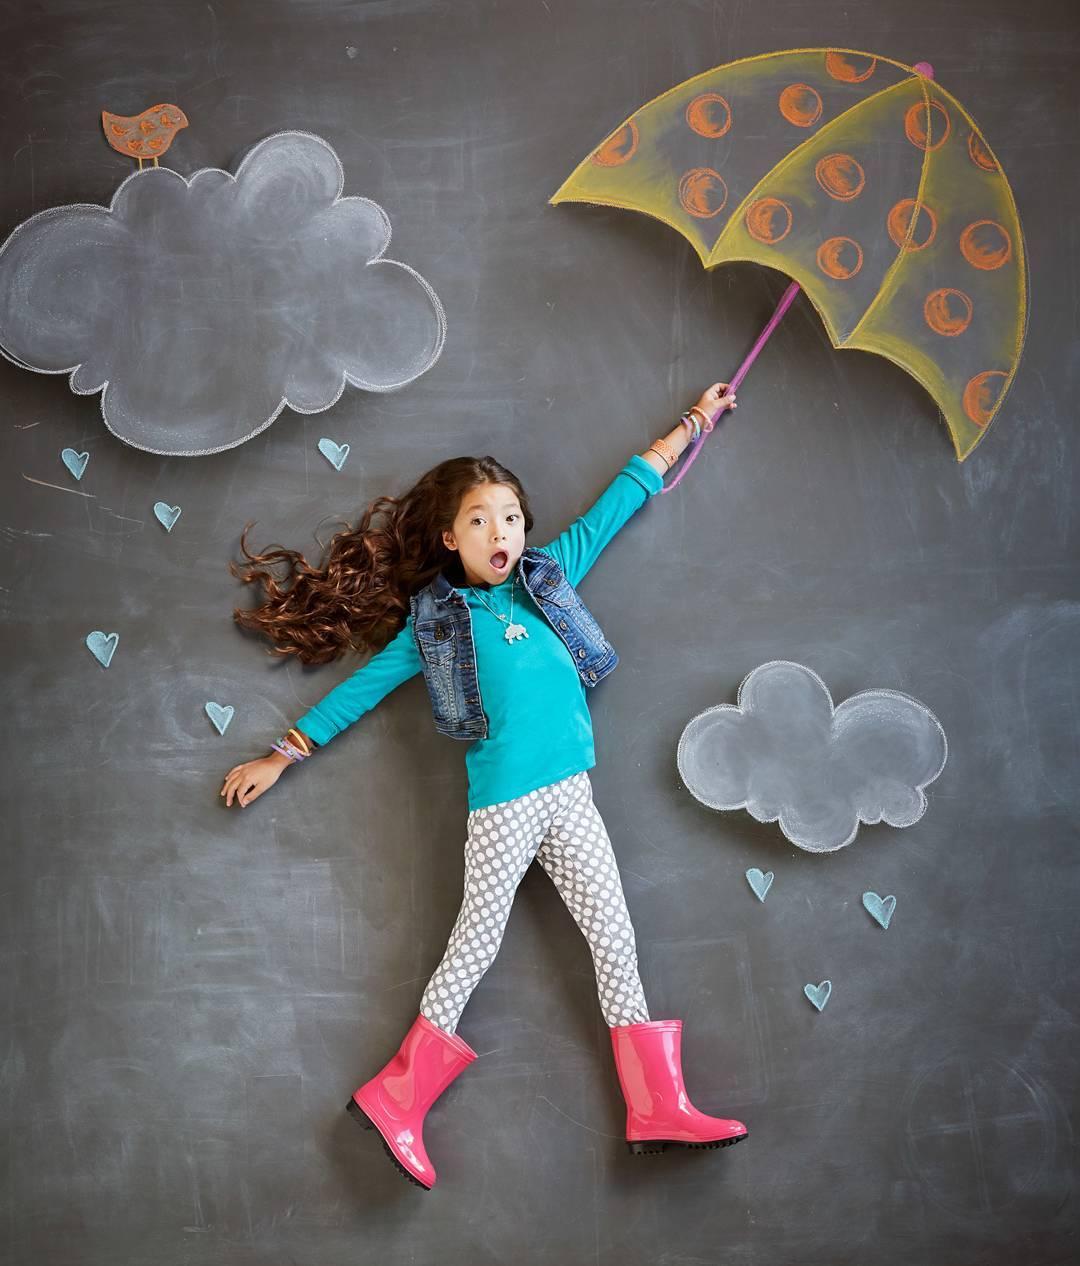 This_gloomy_day_still_has_this_kid_sitting_pretty____rainydays__BacktoSchool__Back2School__Kids__UtahPhotography__CommercialPhotography__Kids__KidModels__Beprepared.jpg